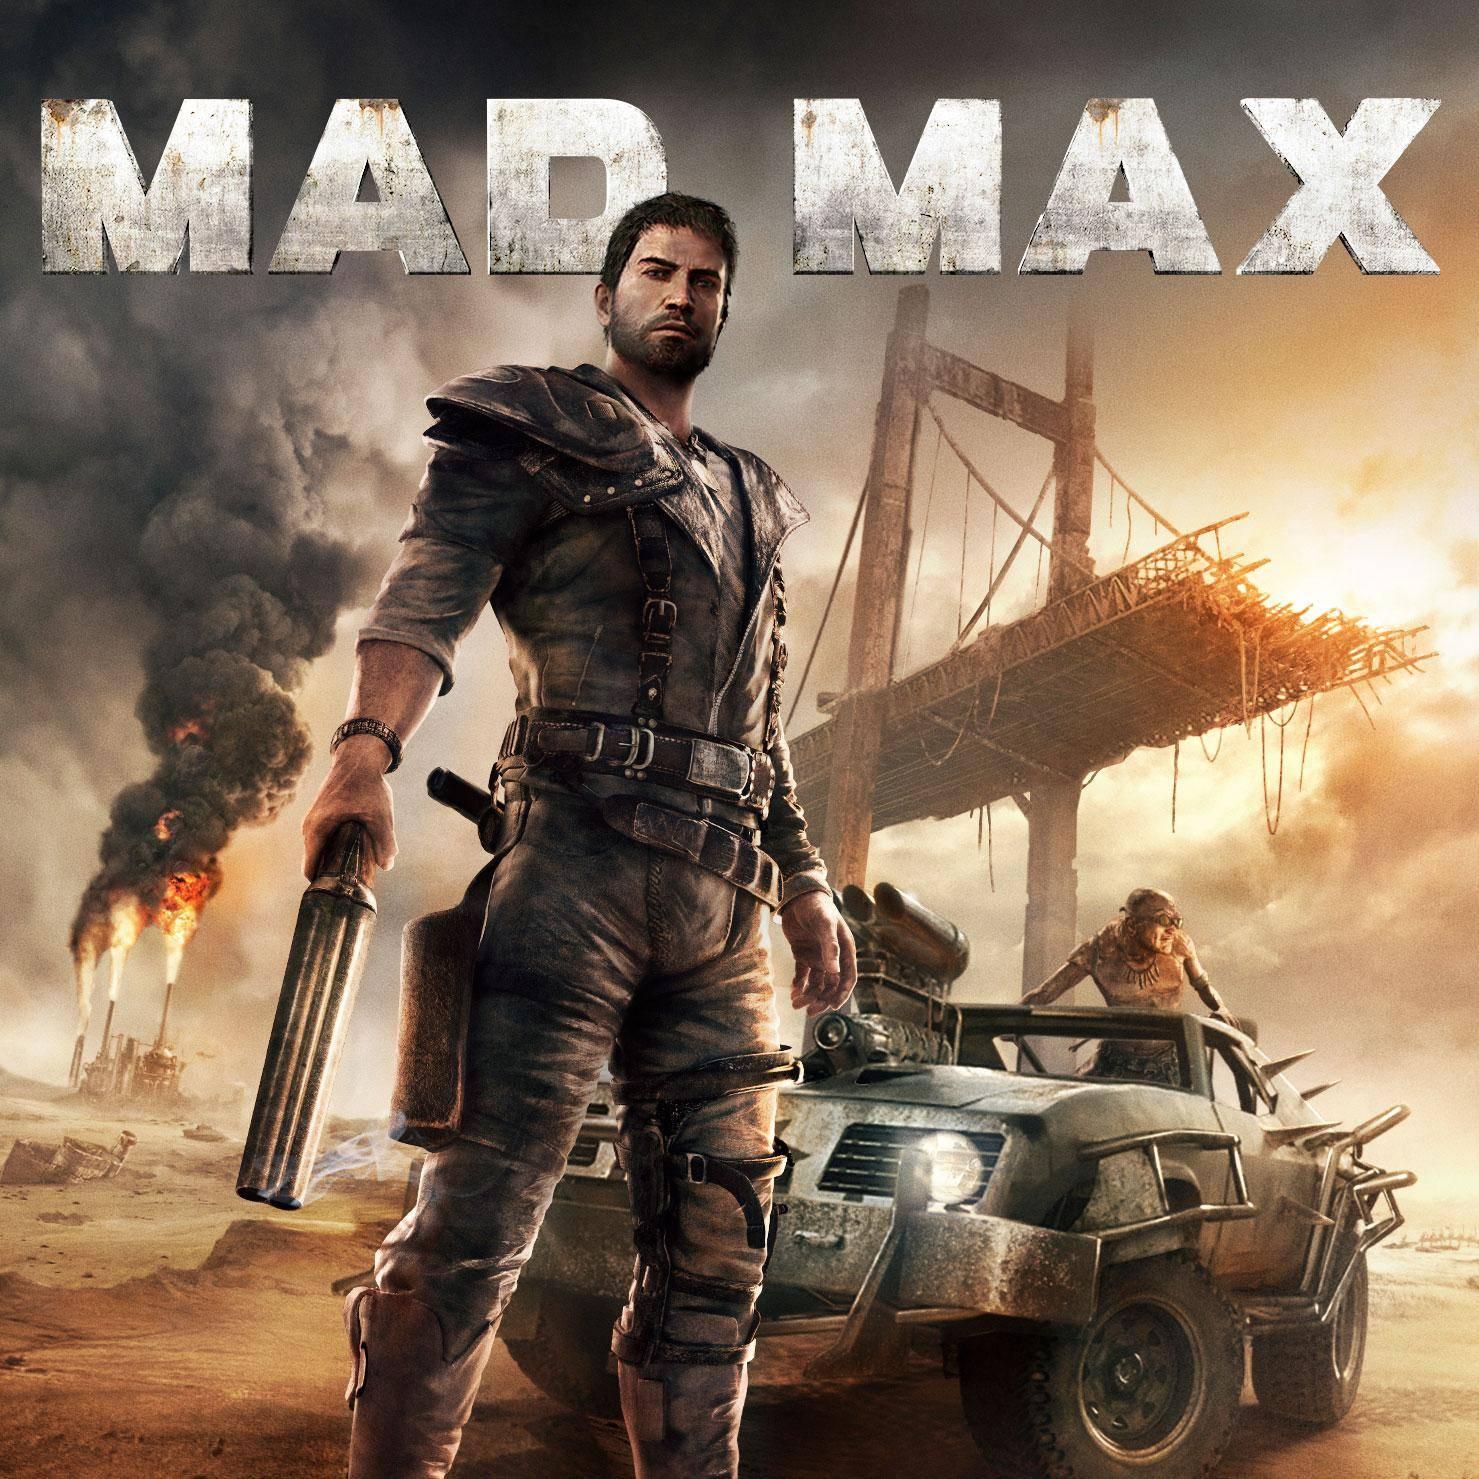 ec1d0670-e075-4a7b-9c6a-56f566f4fd59._V306711358_ Mad Max Review Mad Max Review ec1d0670 e075 4a7b 9c6a 56f566f4fd59